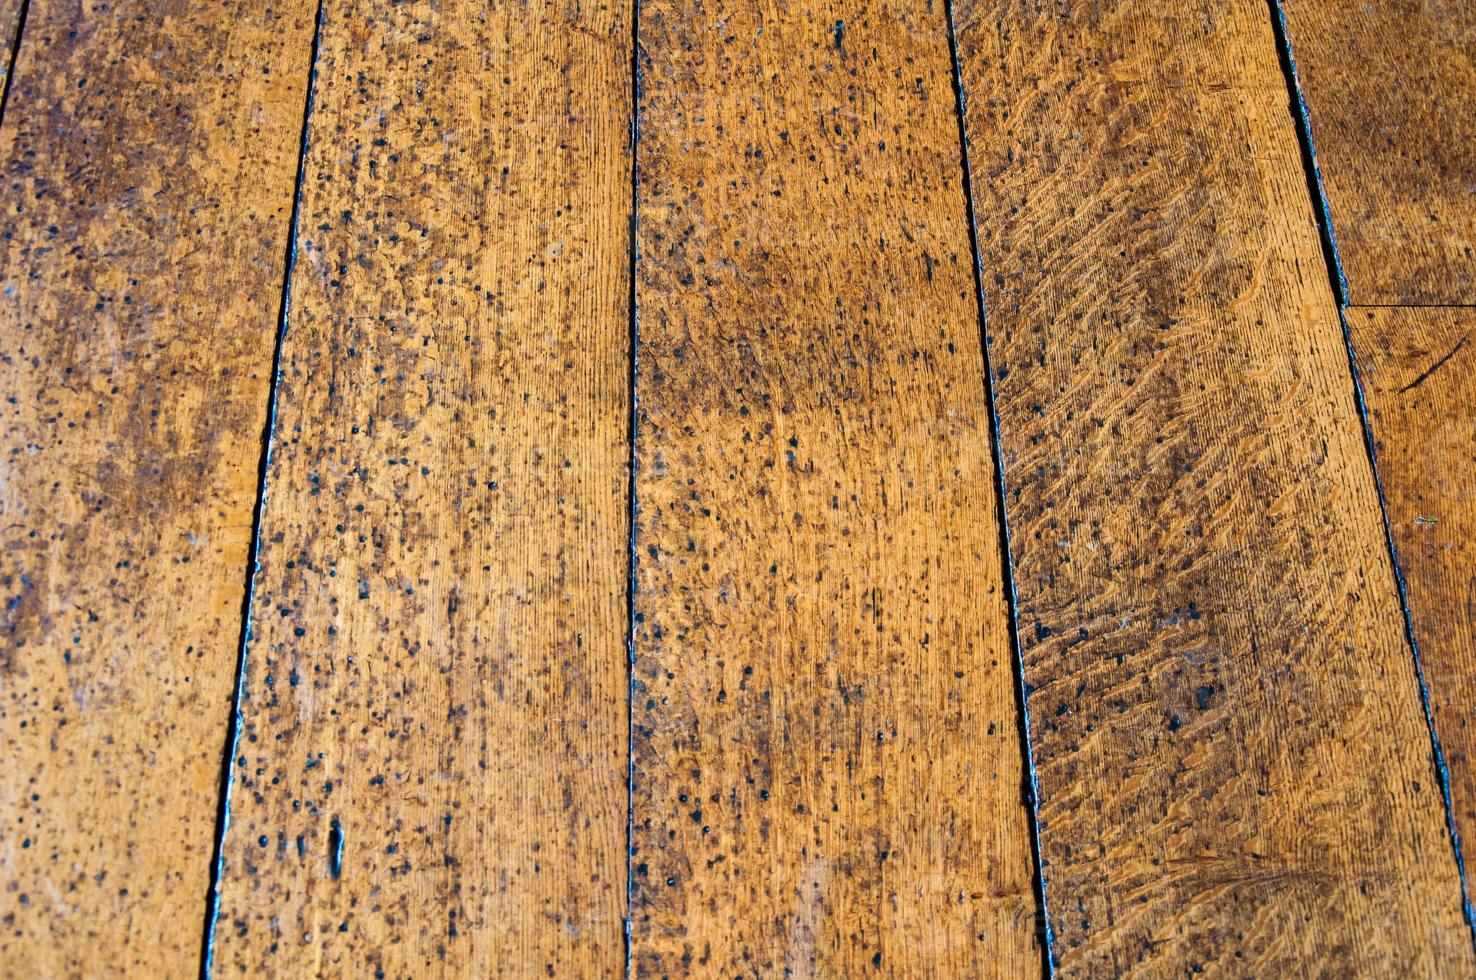 textura de piso de madera vieja foto